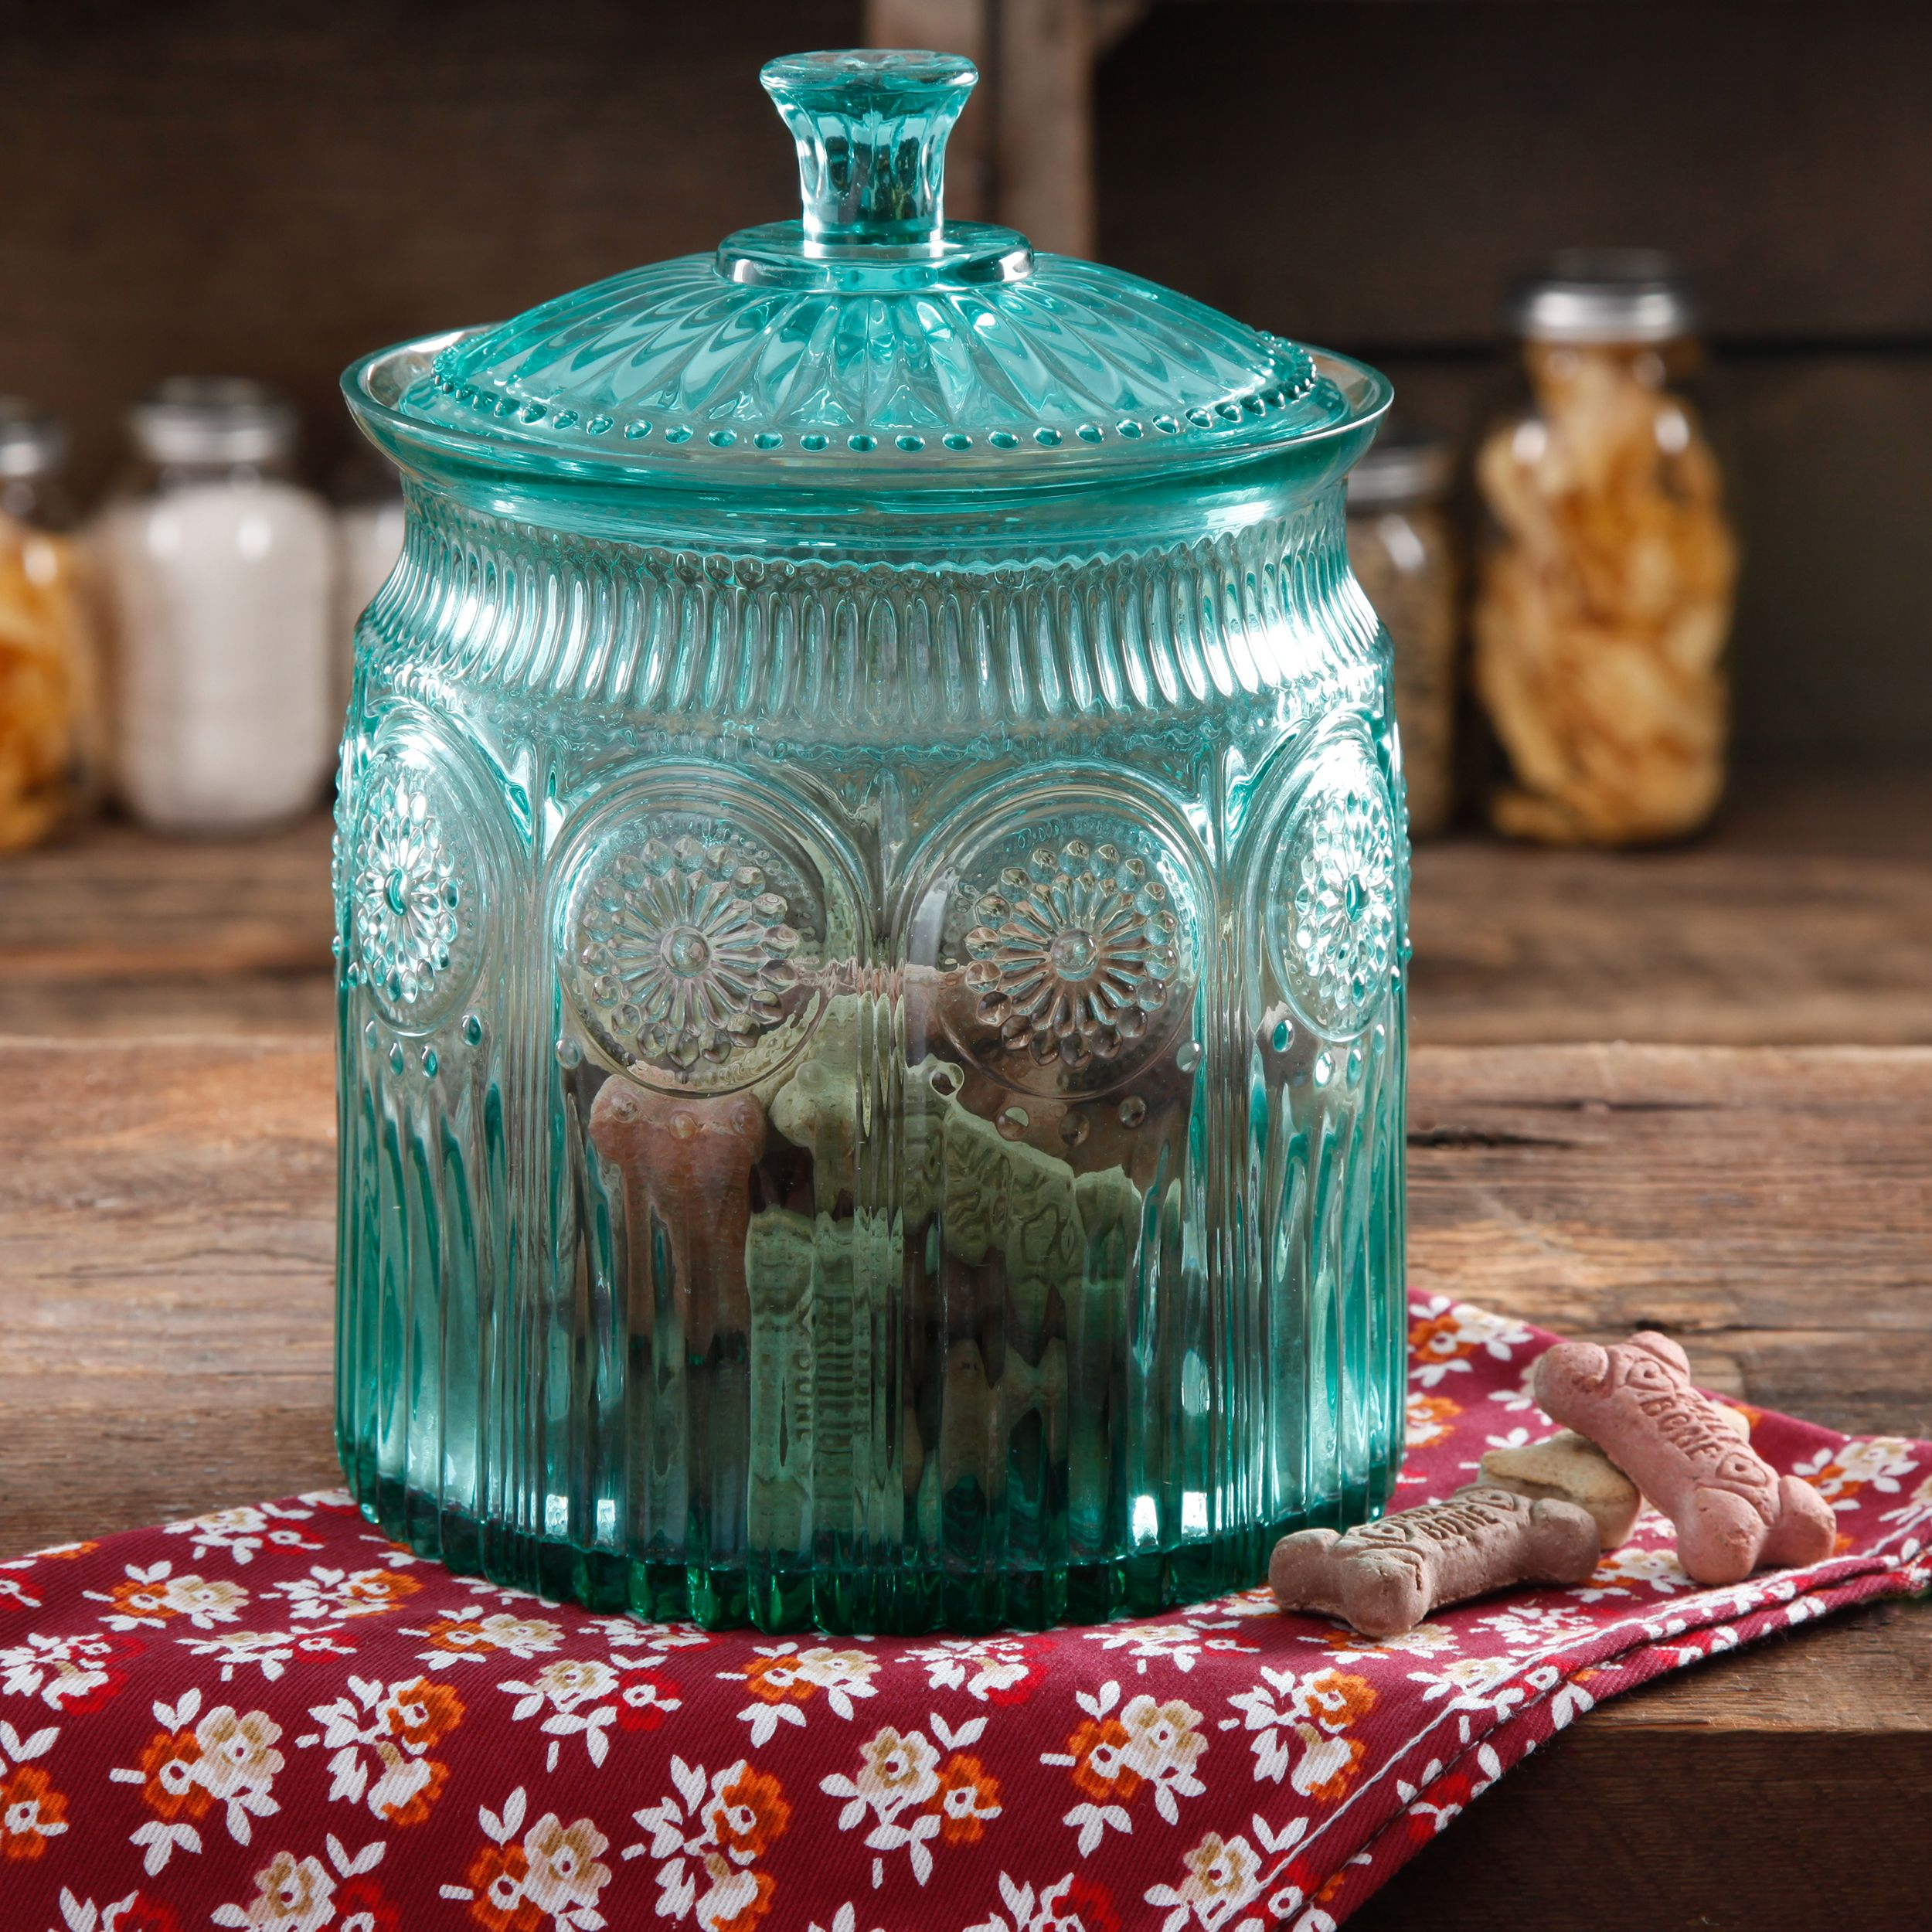 Pioneer Woman Adeline Glass Cookie Jar Turquoise